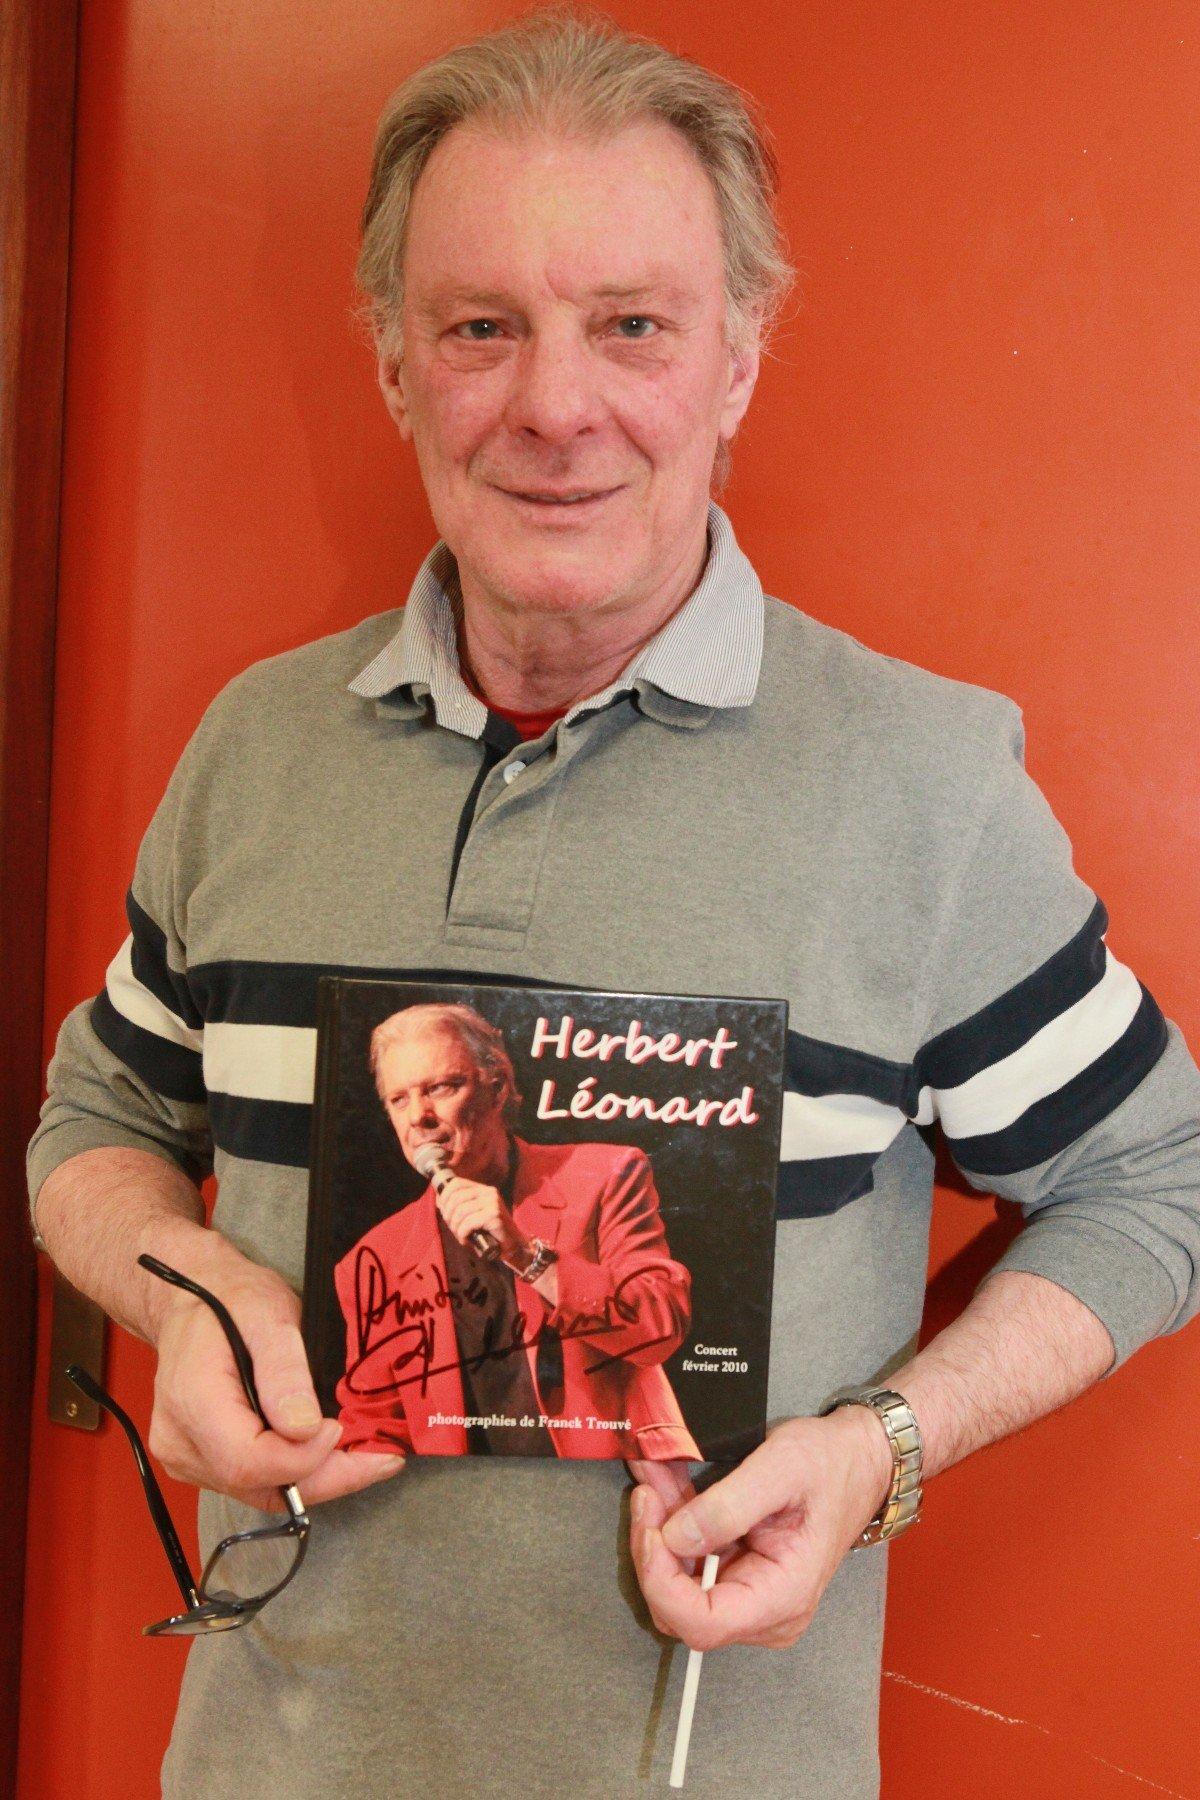 herbert leonard avec le livre du photographe franck trouvé